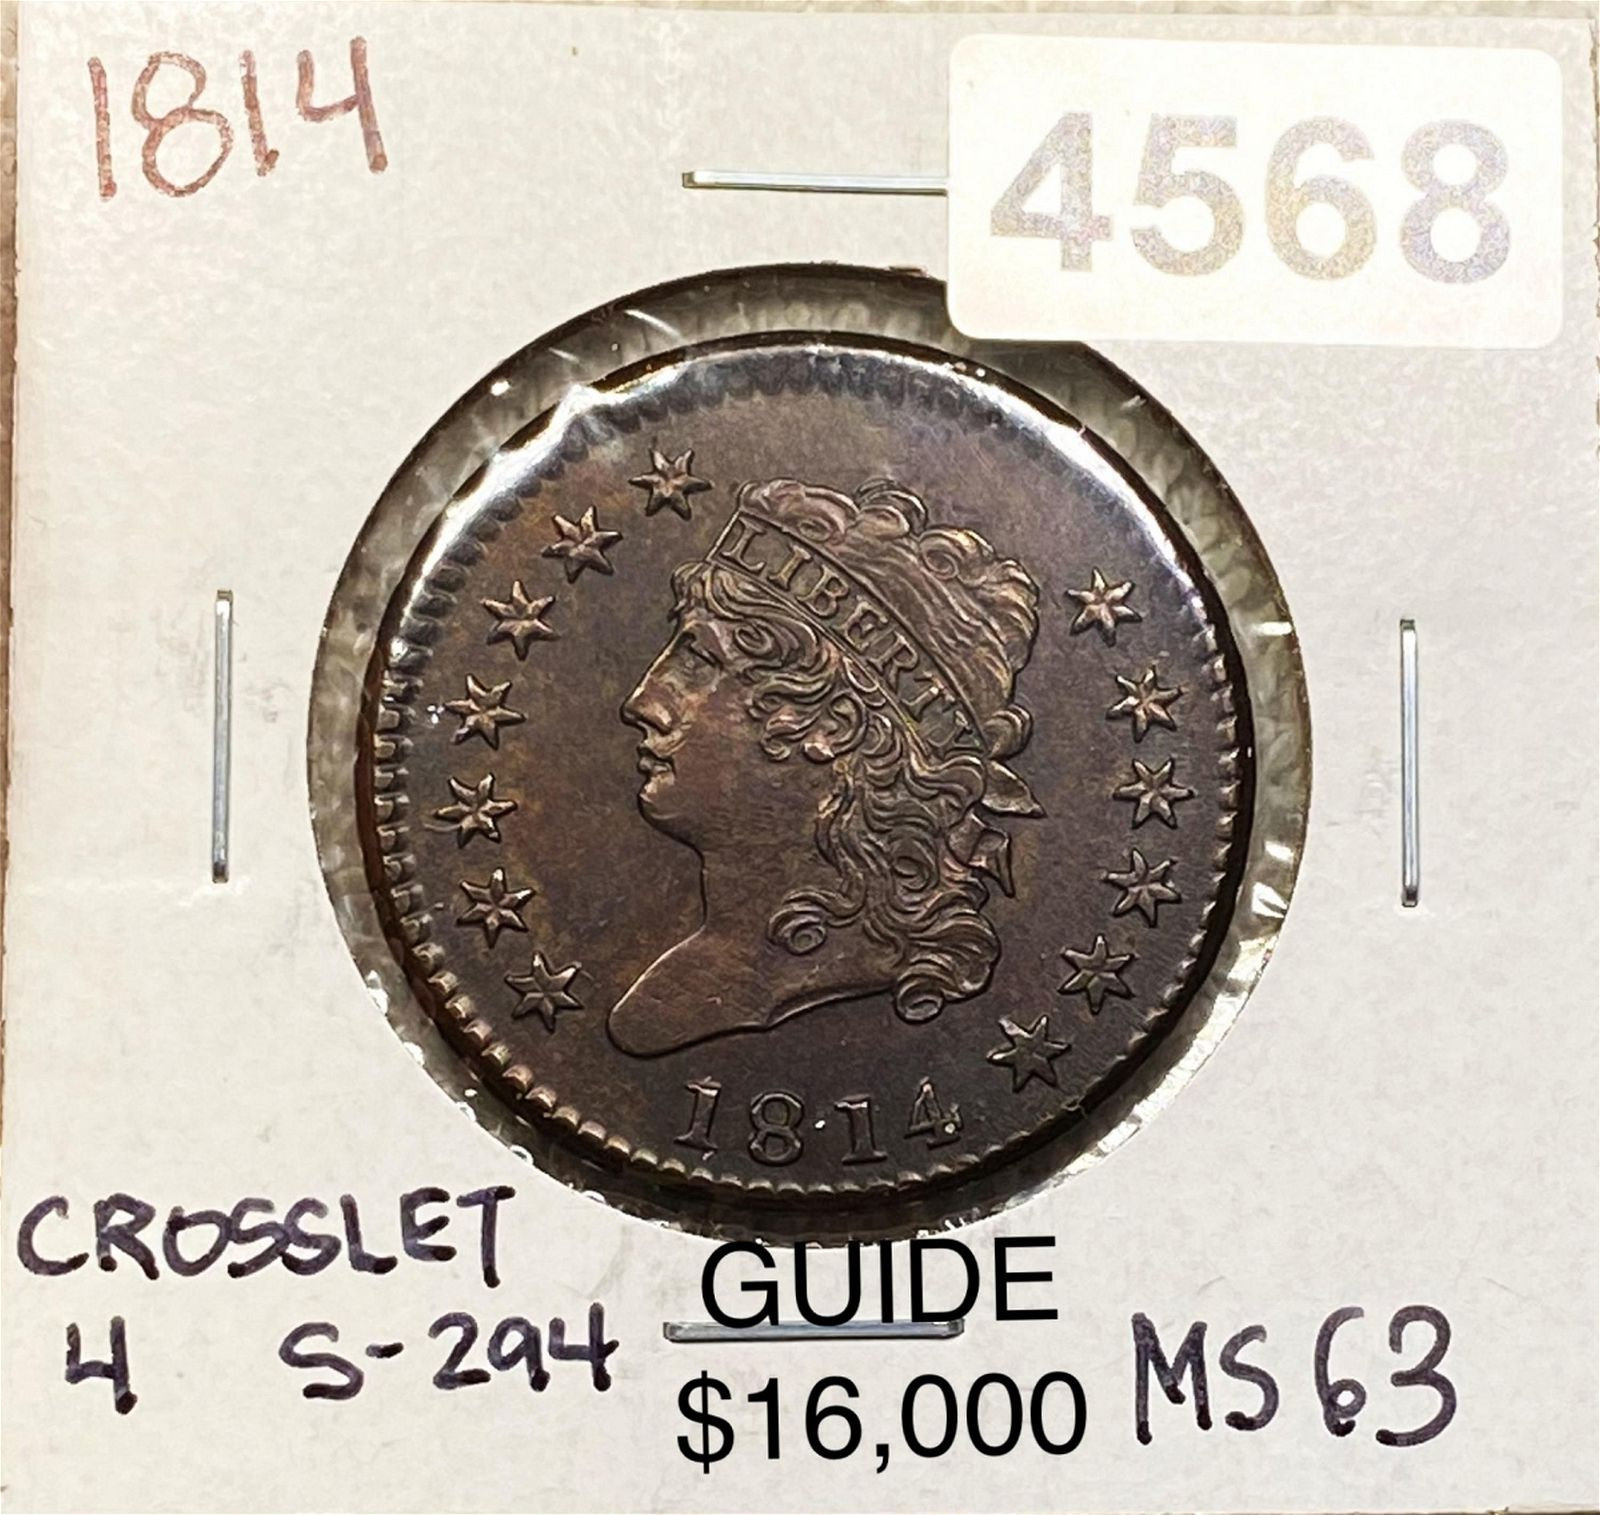 1814 Classic Head Large Cent CHOICE BU CROSSLET 4